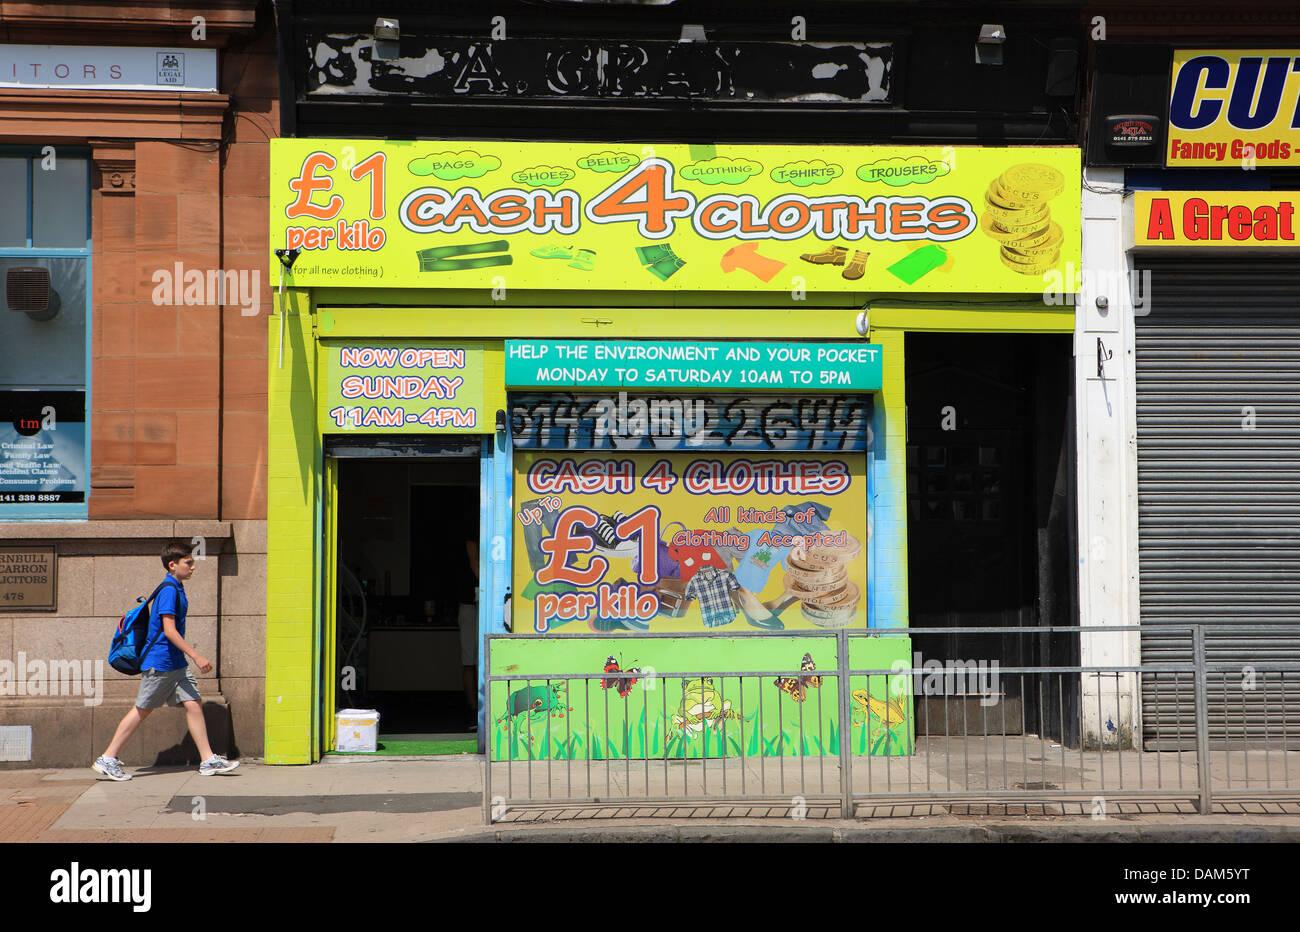 Cash 4 clothes shop in the Partick district of Glasgow, Scotland - Stock Image